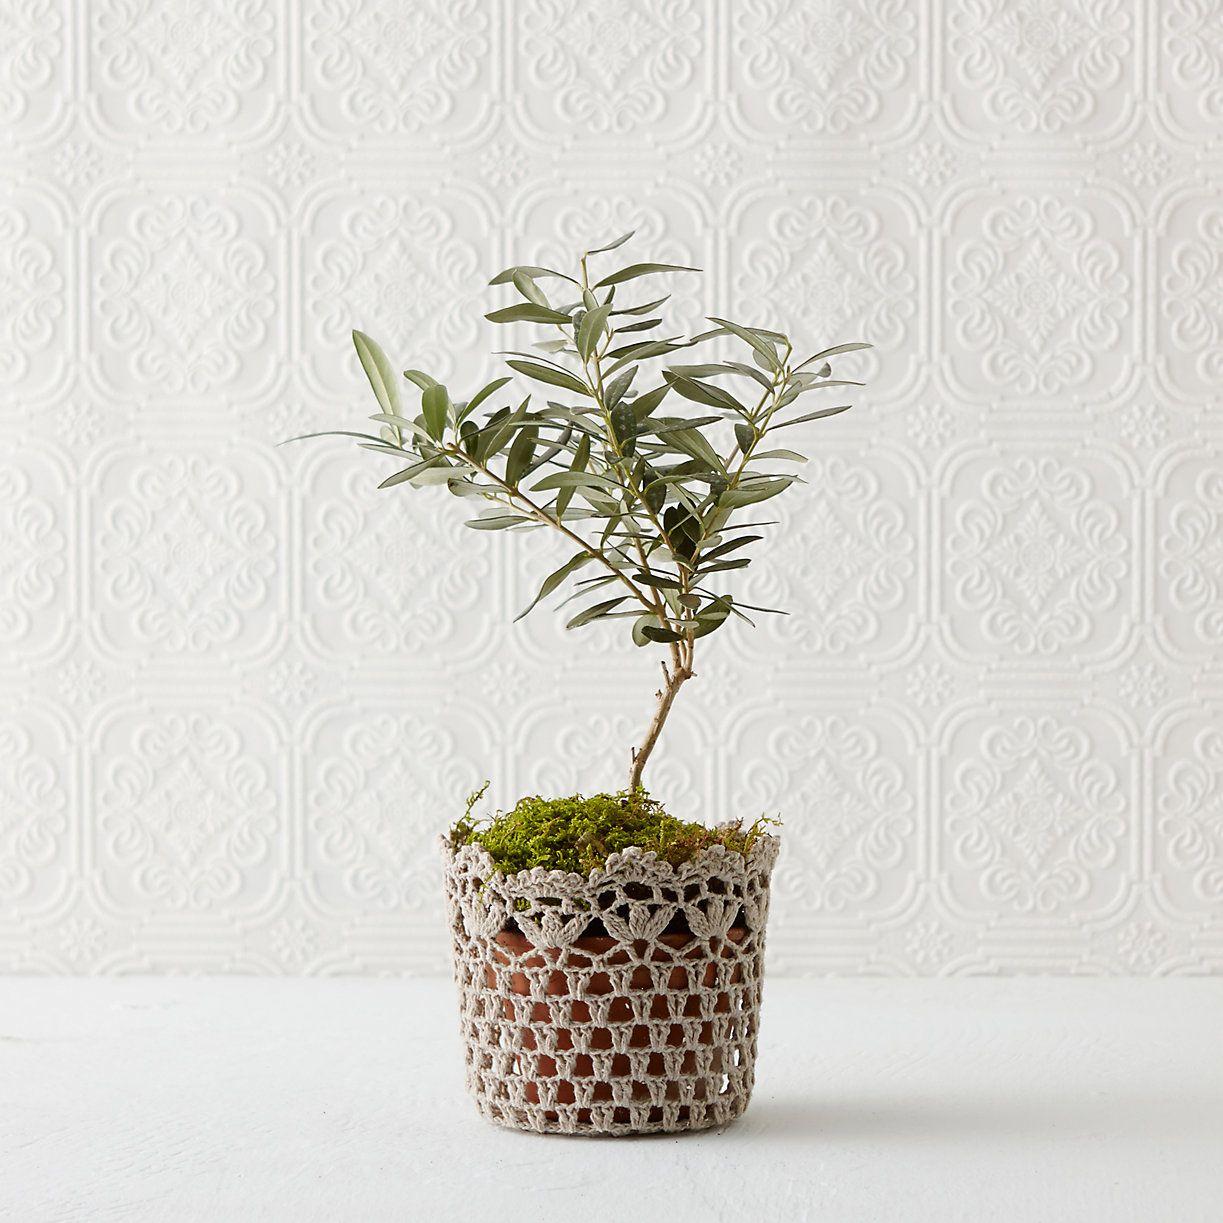 Crochet cotton pot cover flower pots best gifts for